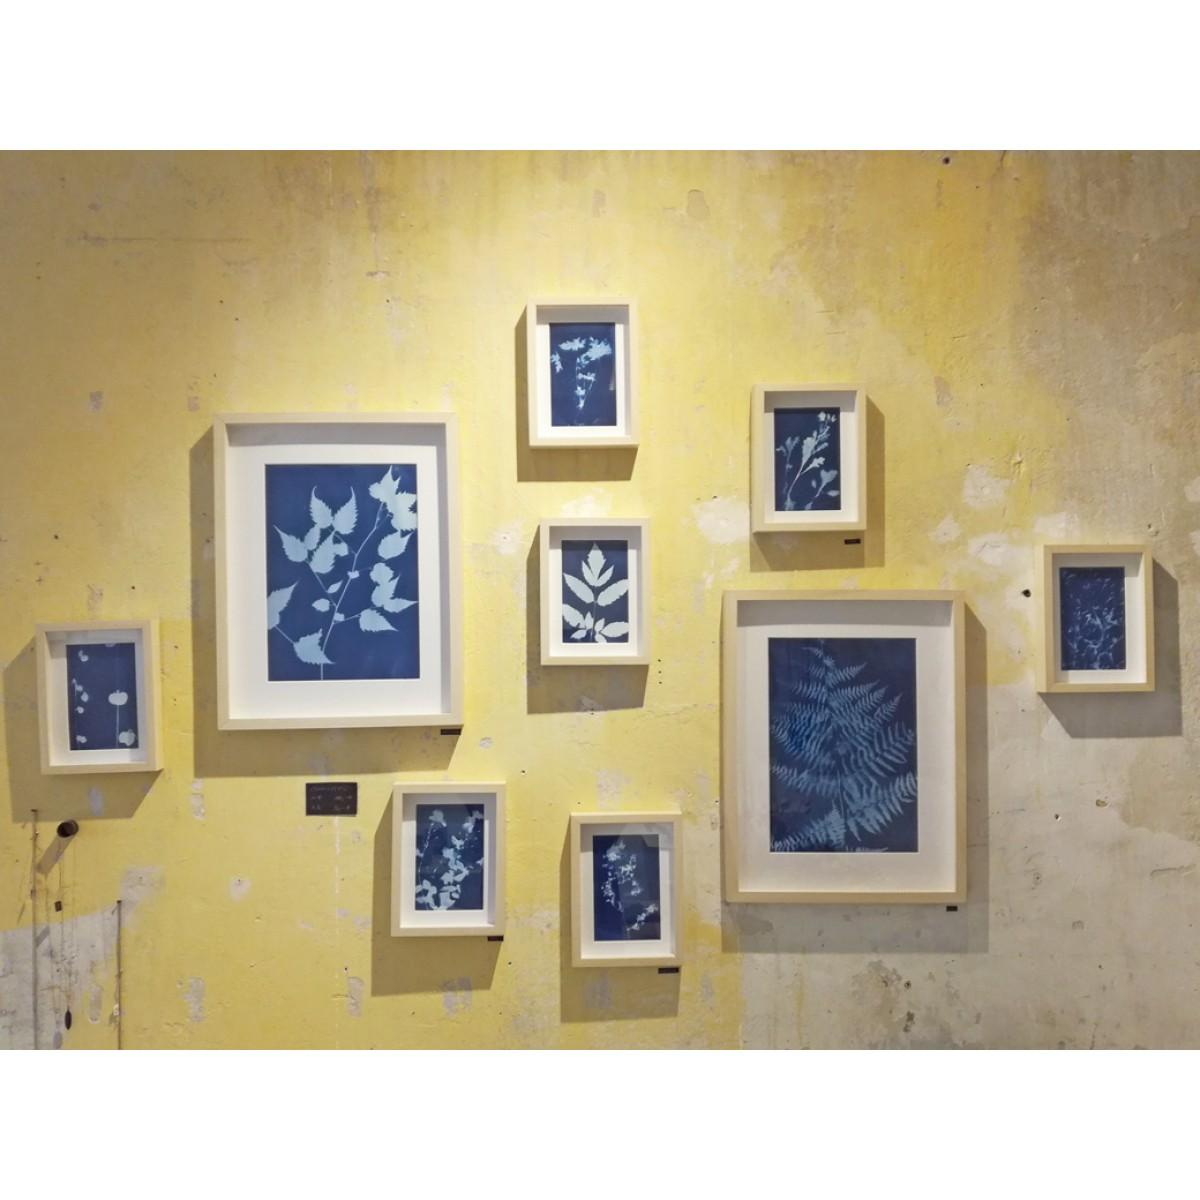 Anka Büchler, Floraler Blaudruck,Cyanotypie, Unikat, A6, Motiv 7